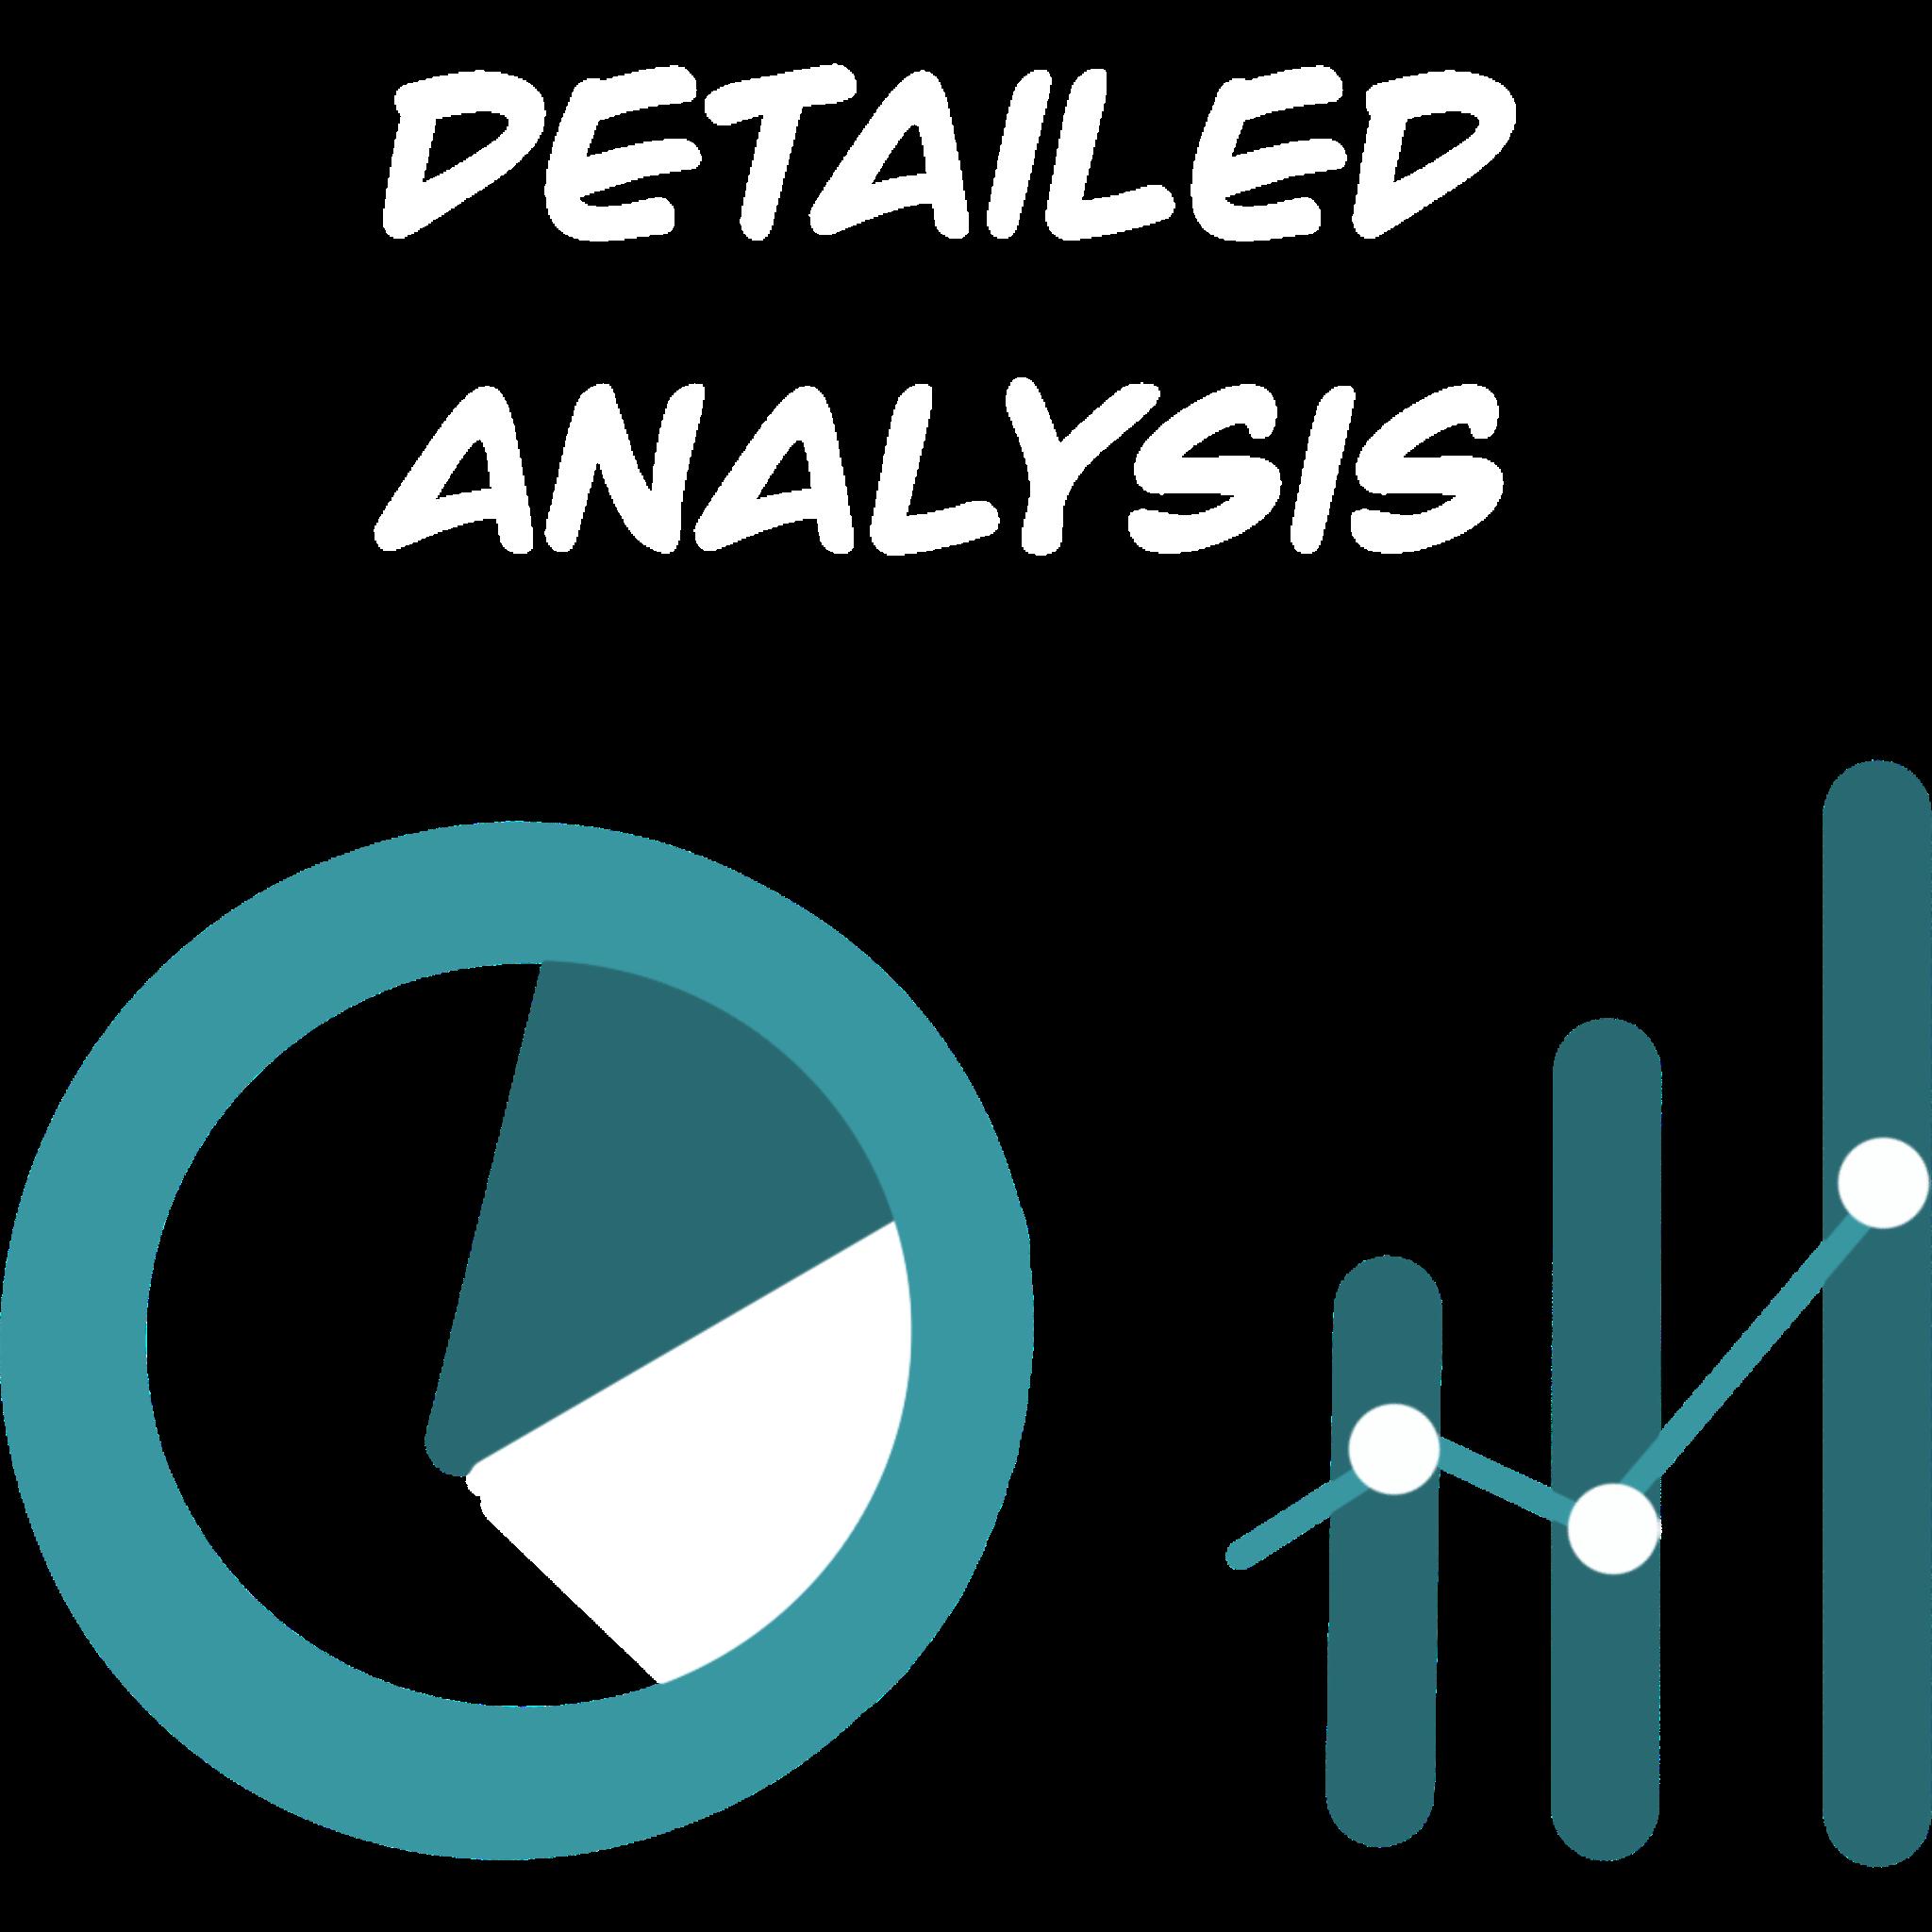 Detailed SEA analysis